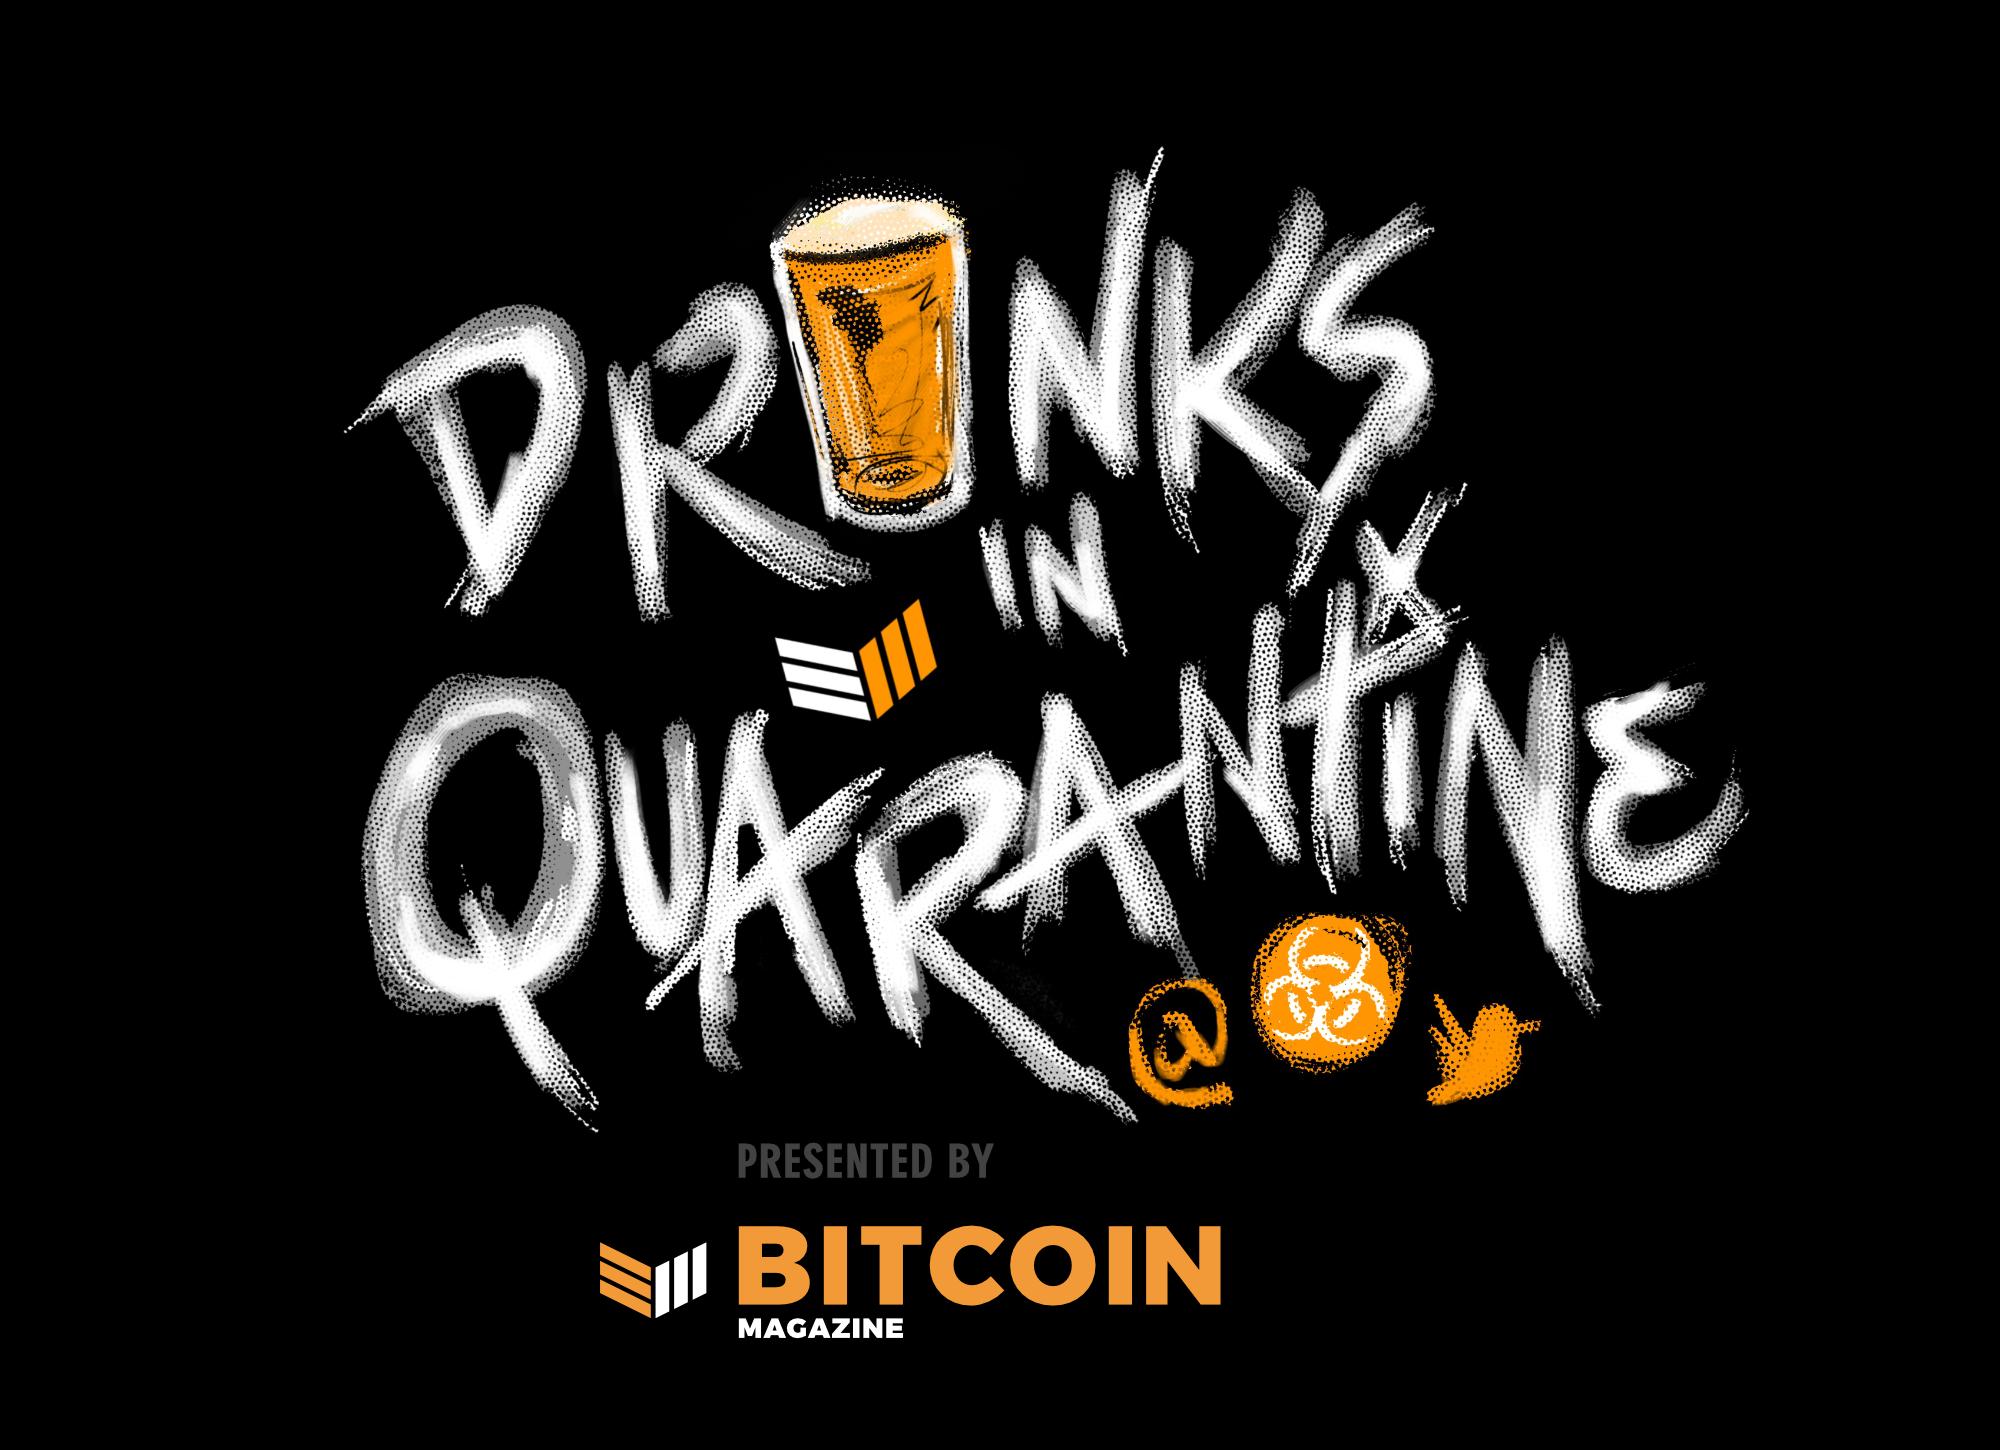 Drinks in Quarantine Podcast (Bitcoin Magazine) branding